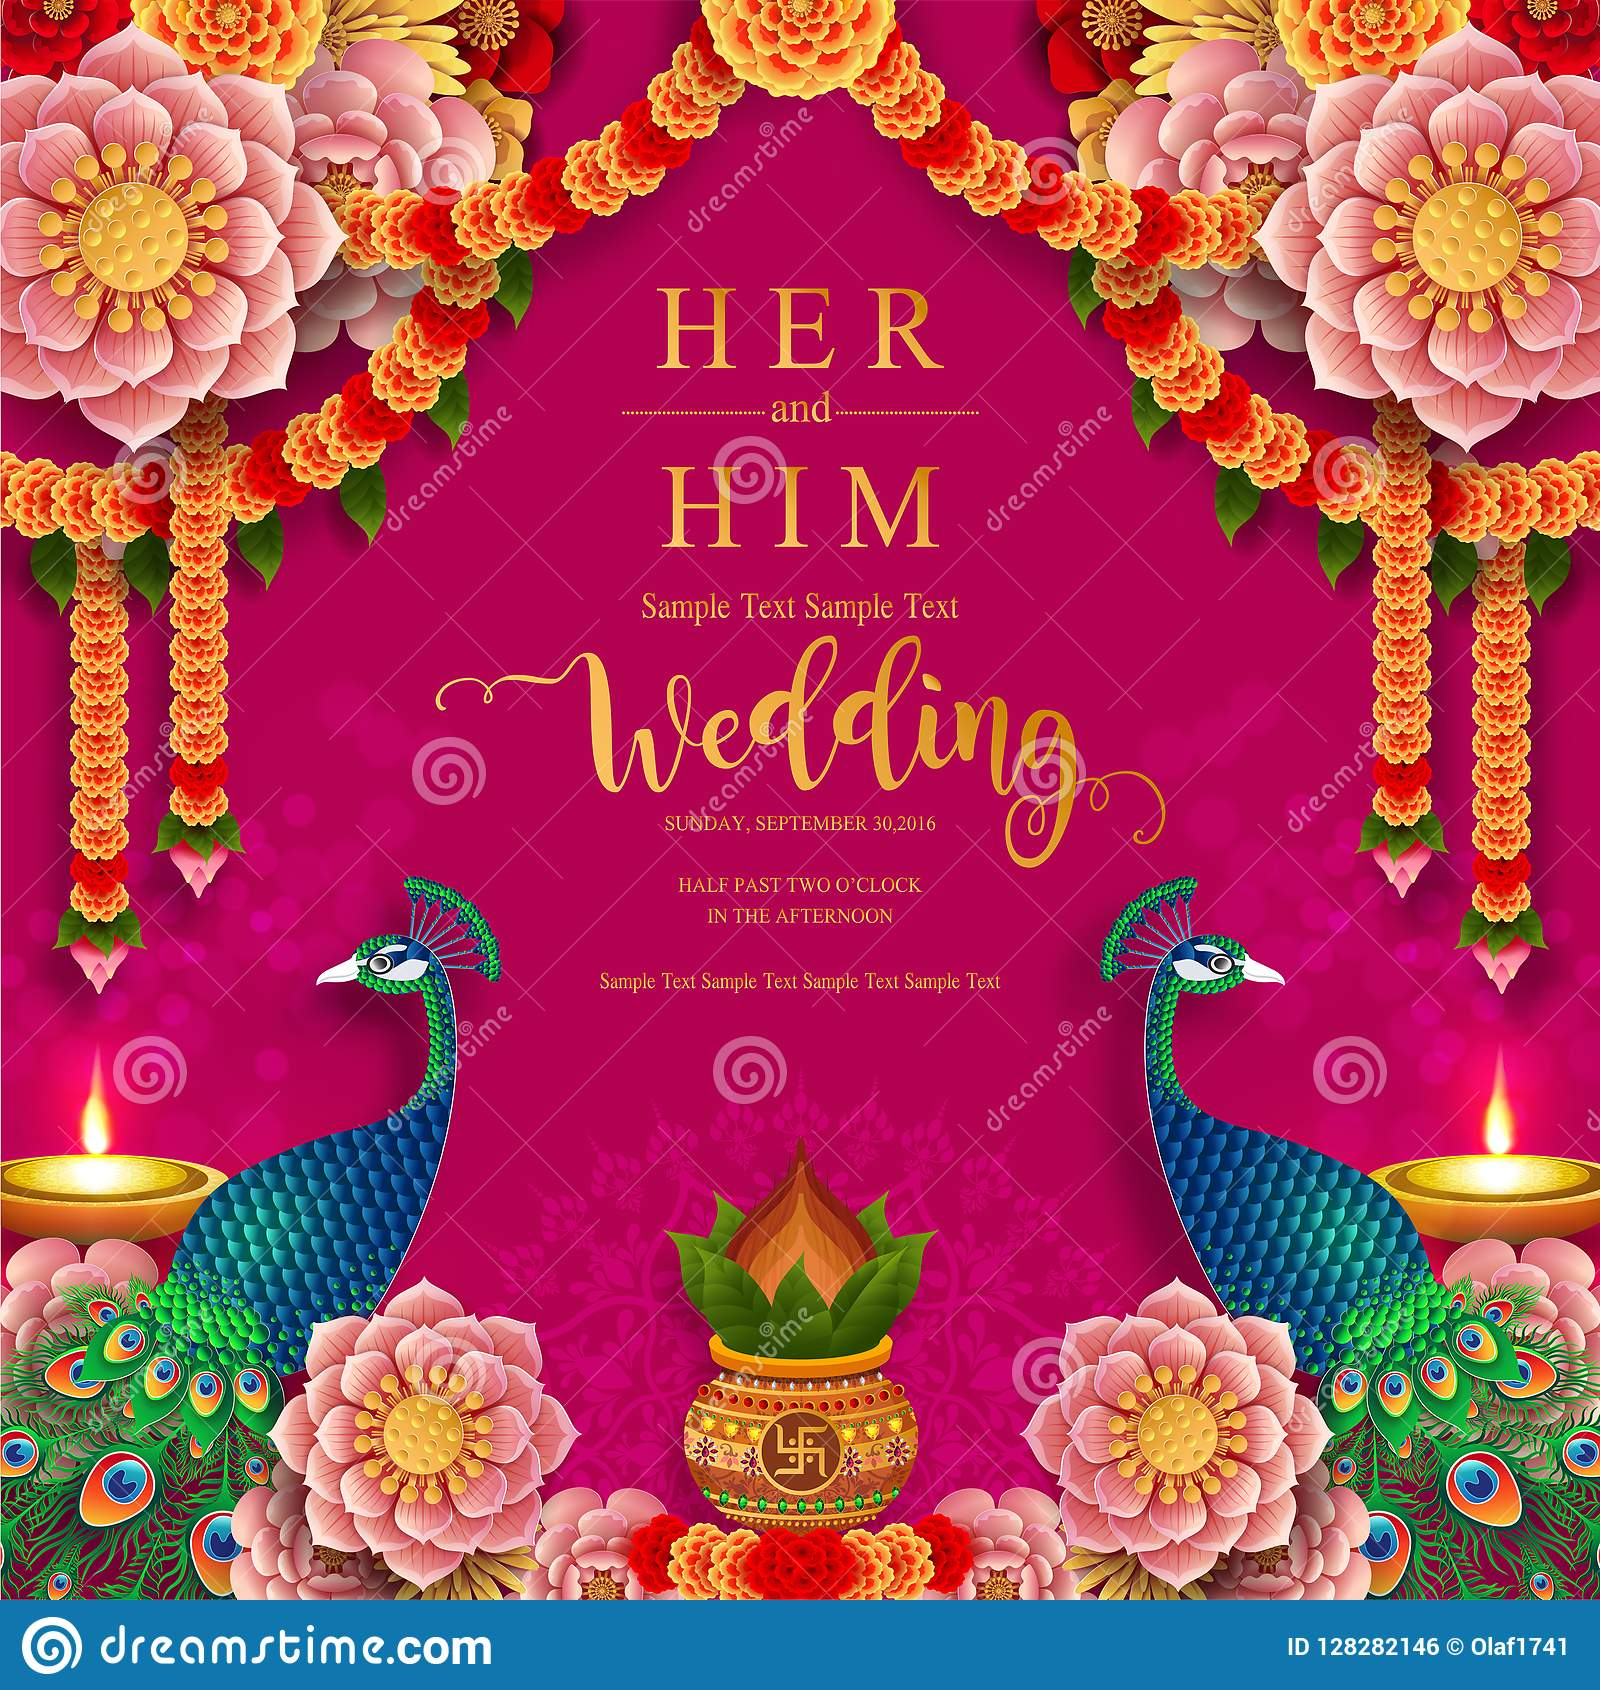 https www dreamstime com inindian wedding invitation carddian wedding invitation card templates gold patterned crystals paper color background image128282146